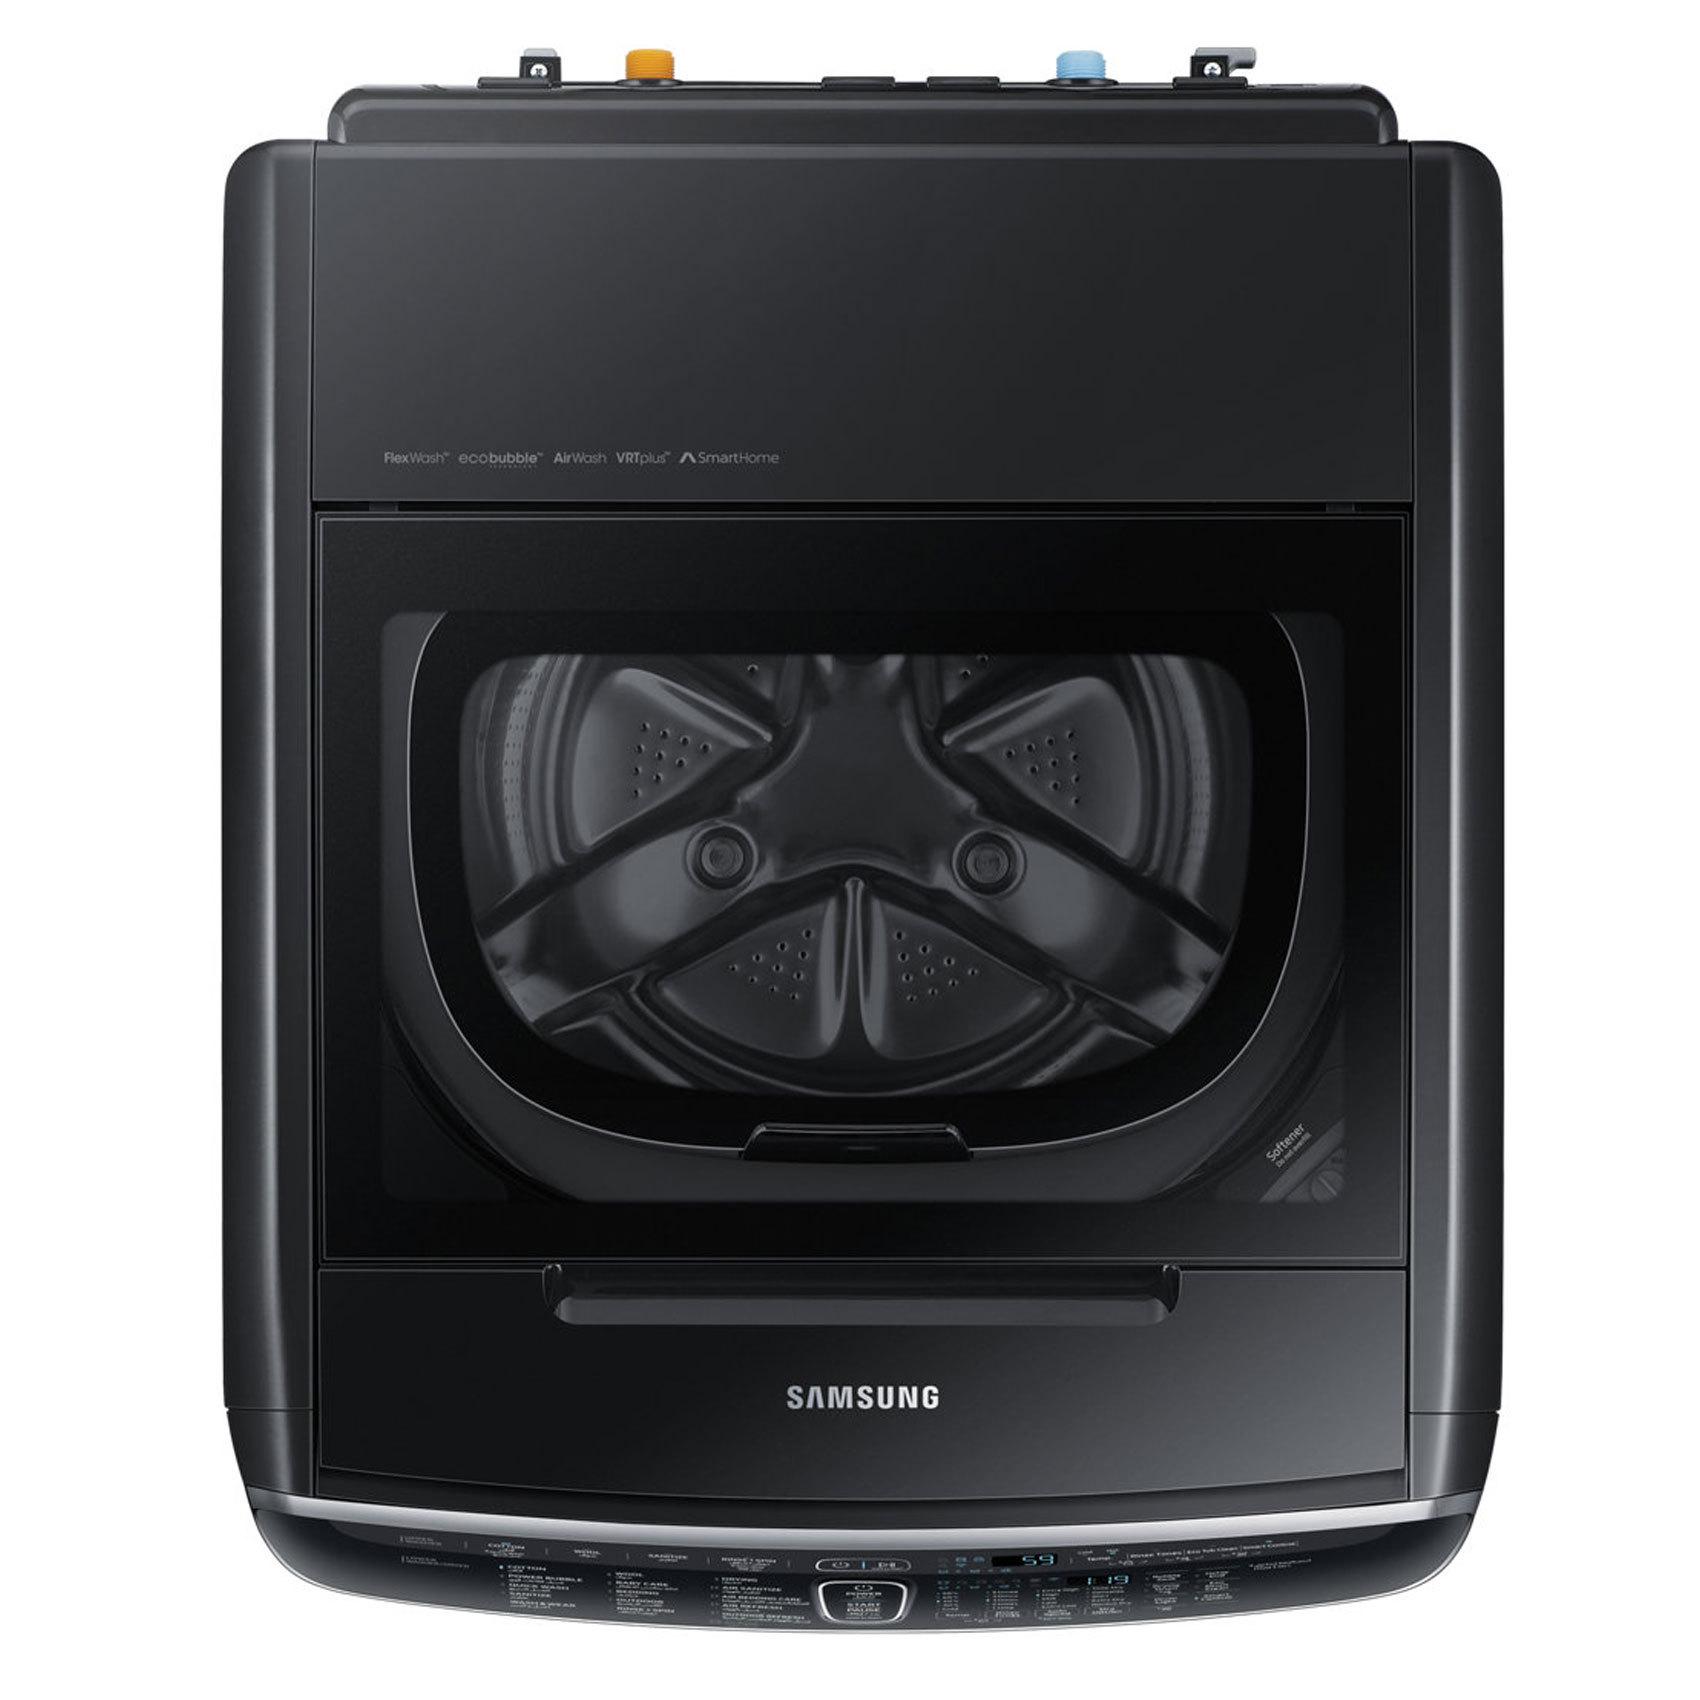 Buy Samsung 17 5kg Washer And 9kg Dryer Wd70k5410ow Online